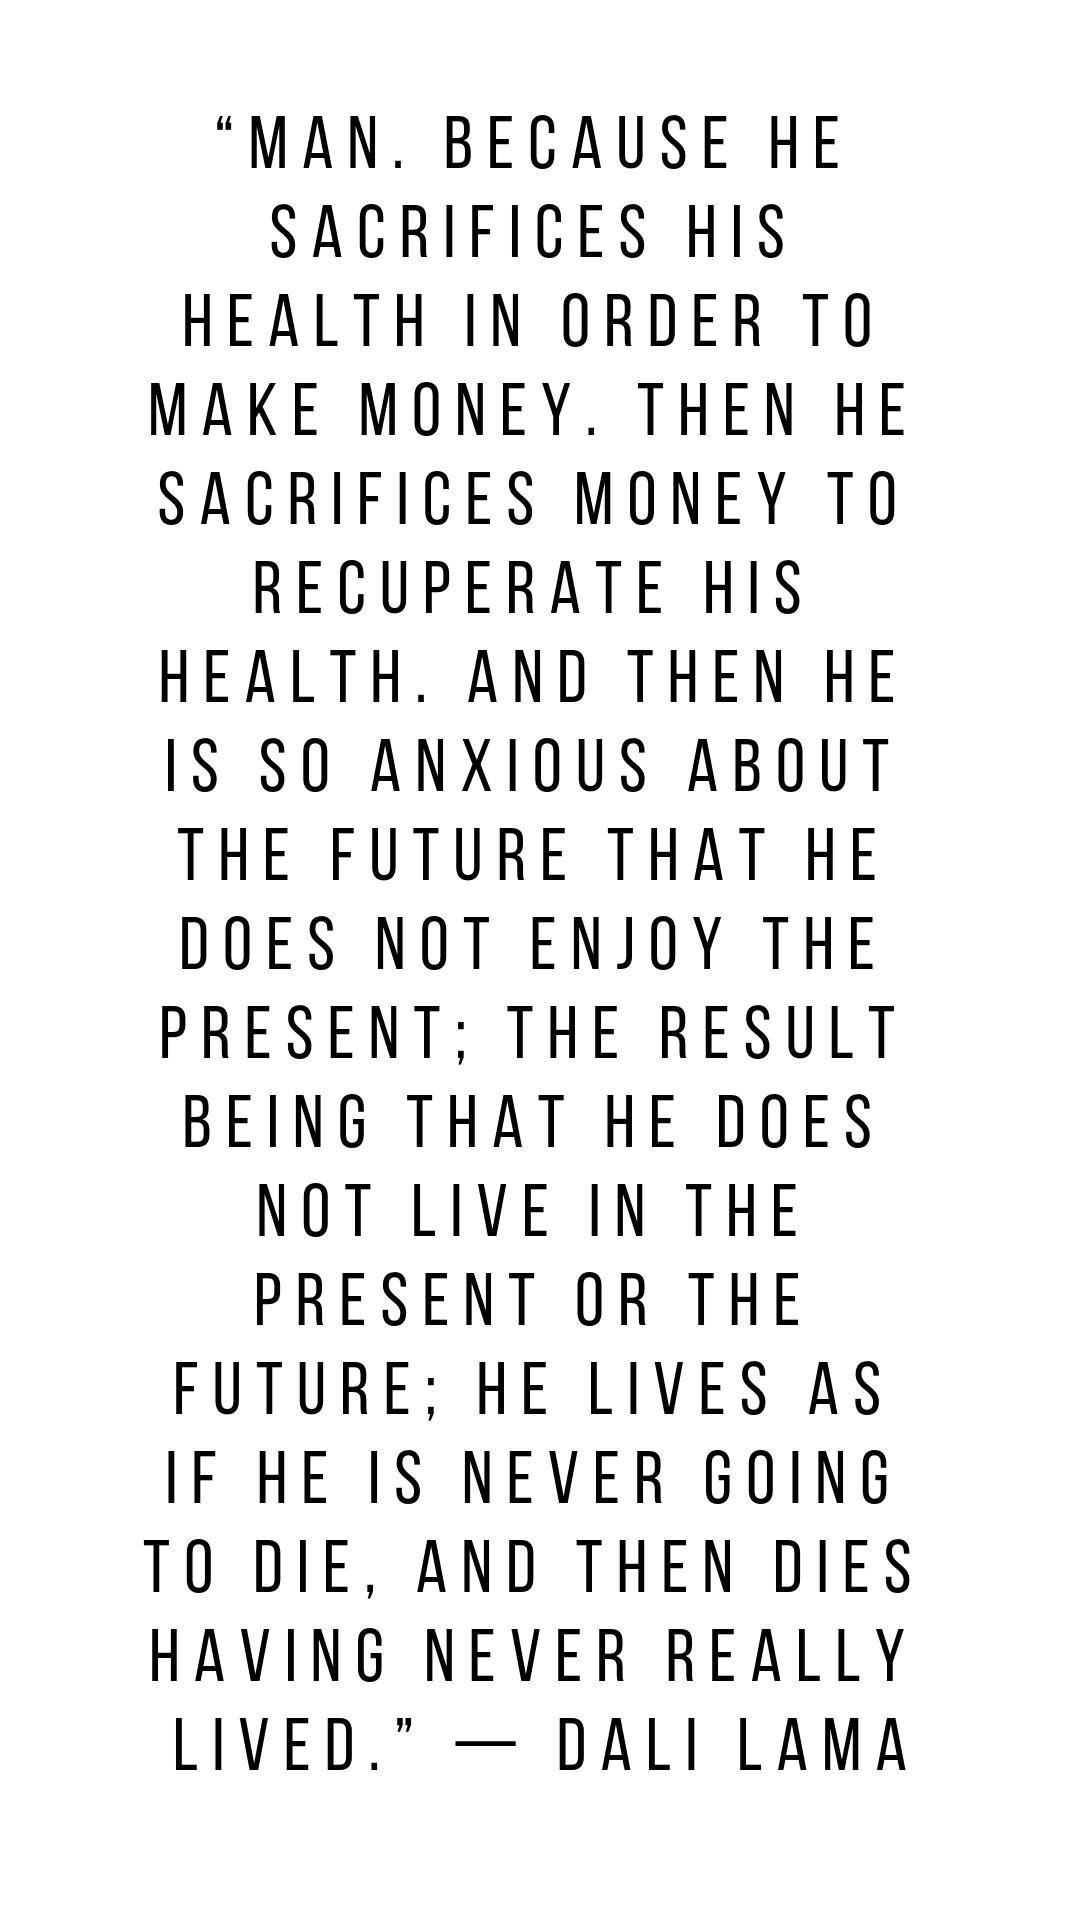 Dalai Lama Quotes Man Sacrifices Health For Money